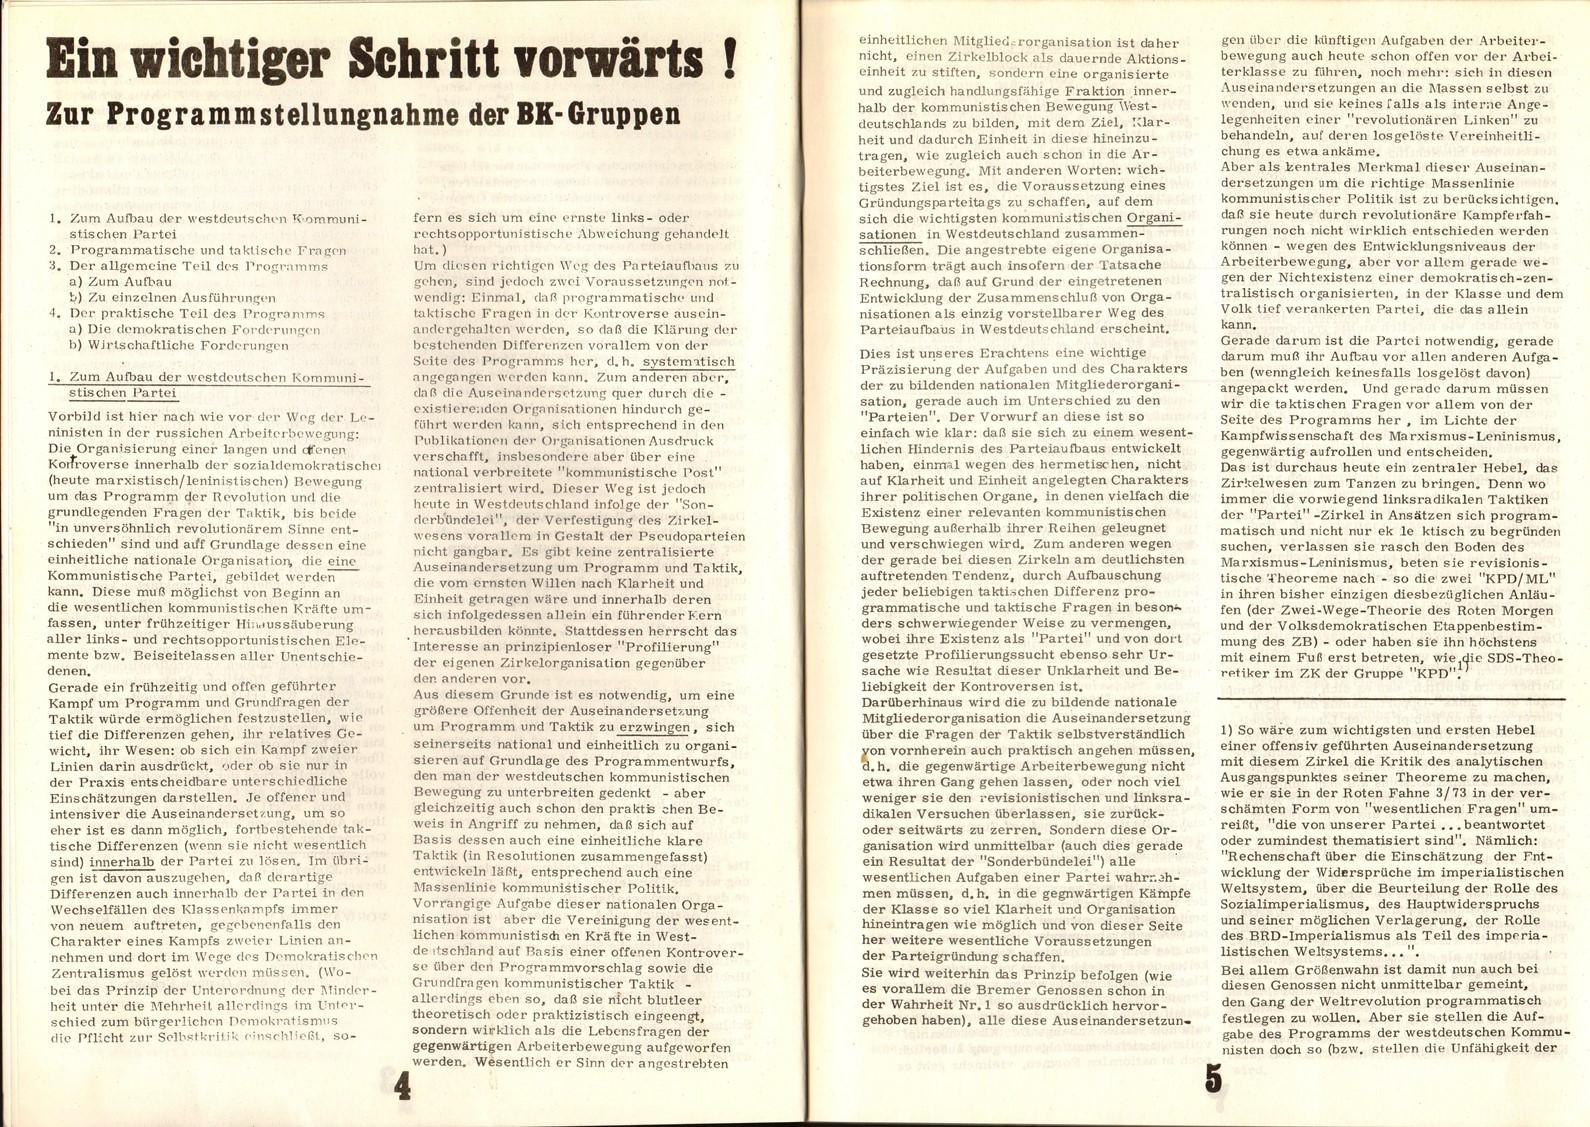 Frankfurt_Offenbach_KG_Kampf_Kritik_Umgestaltung_1973_02_04